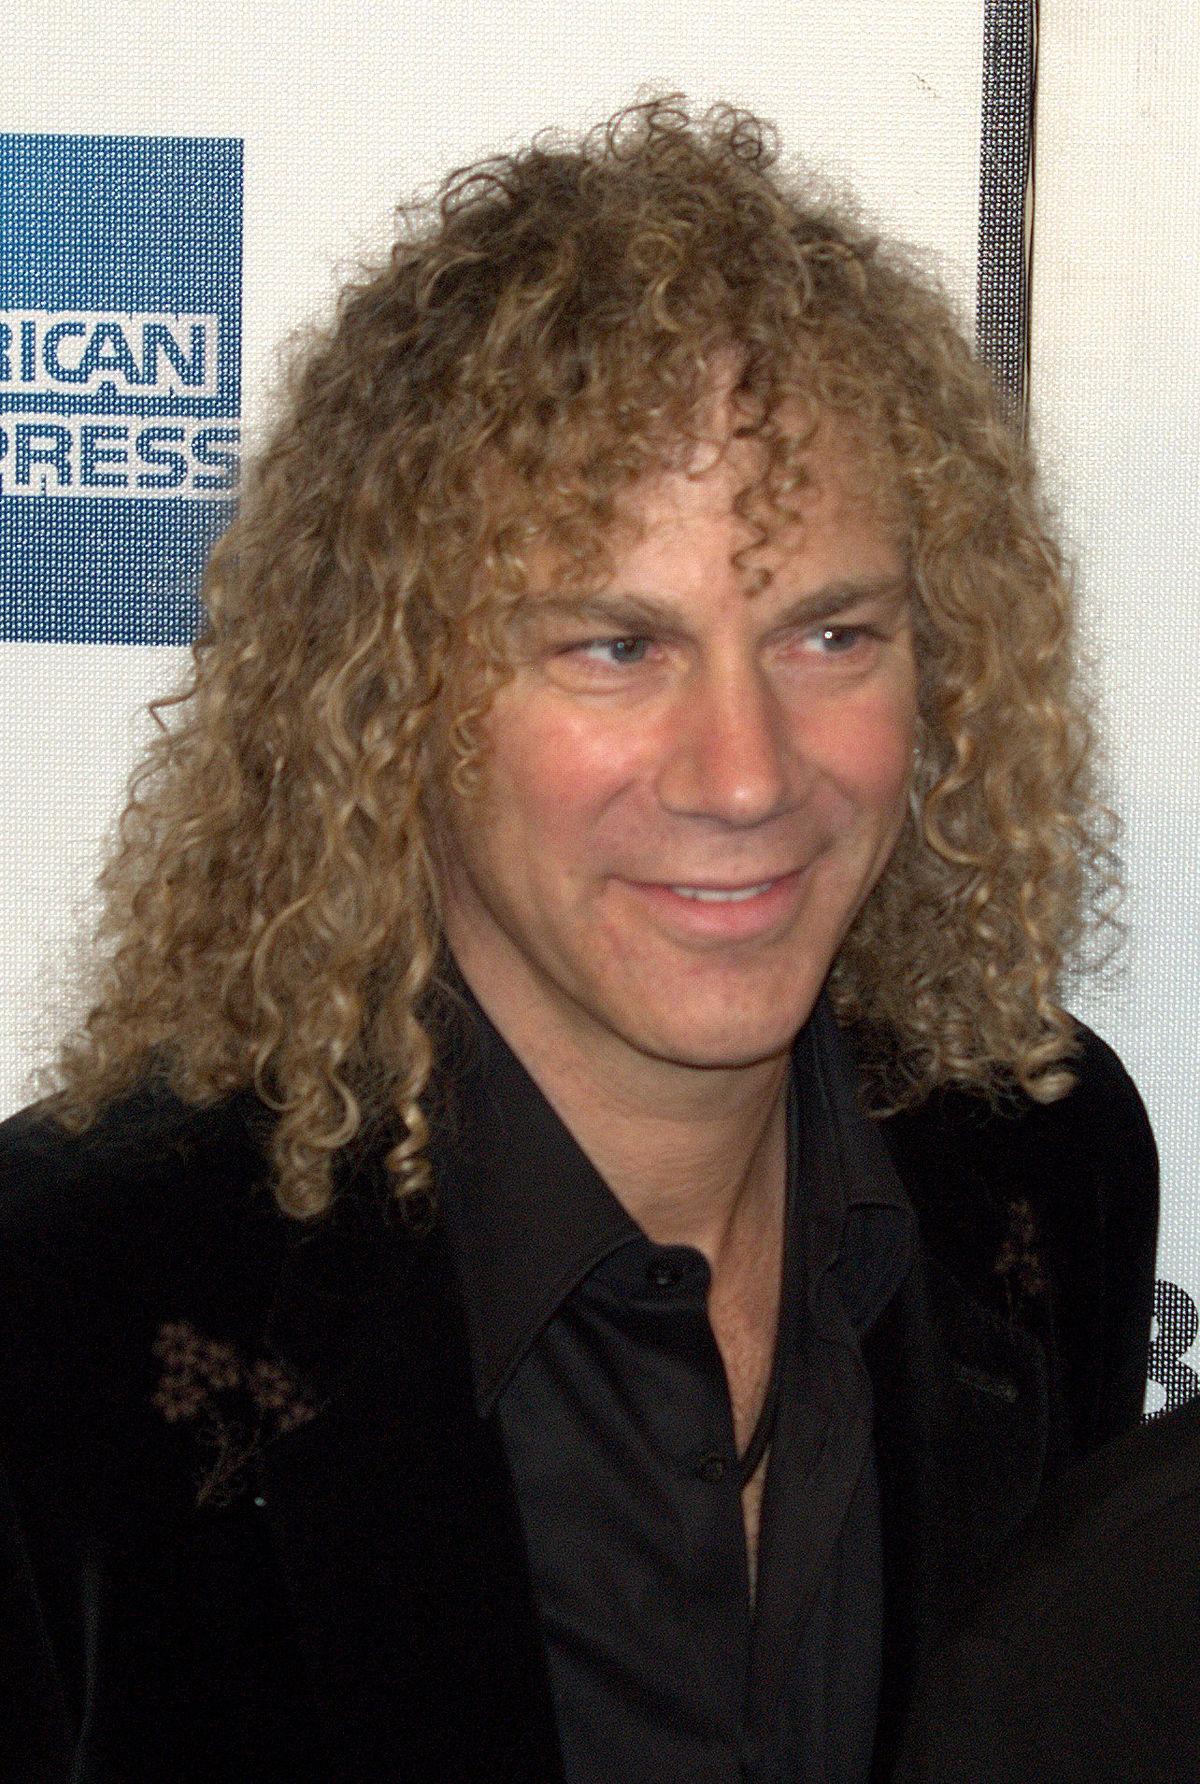 David Bryan - Wikipedia